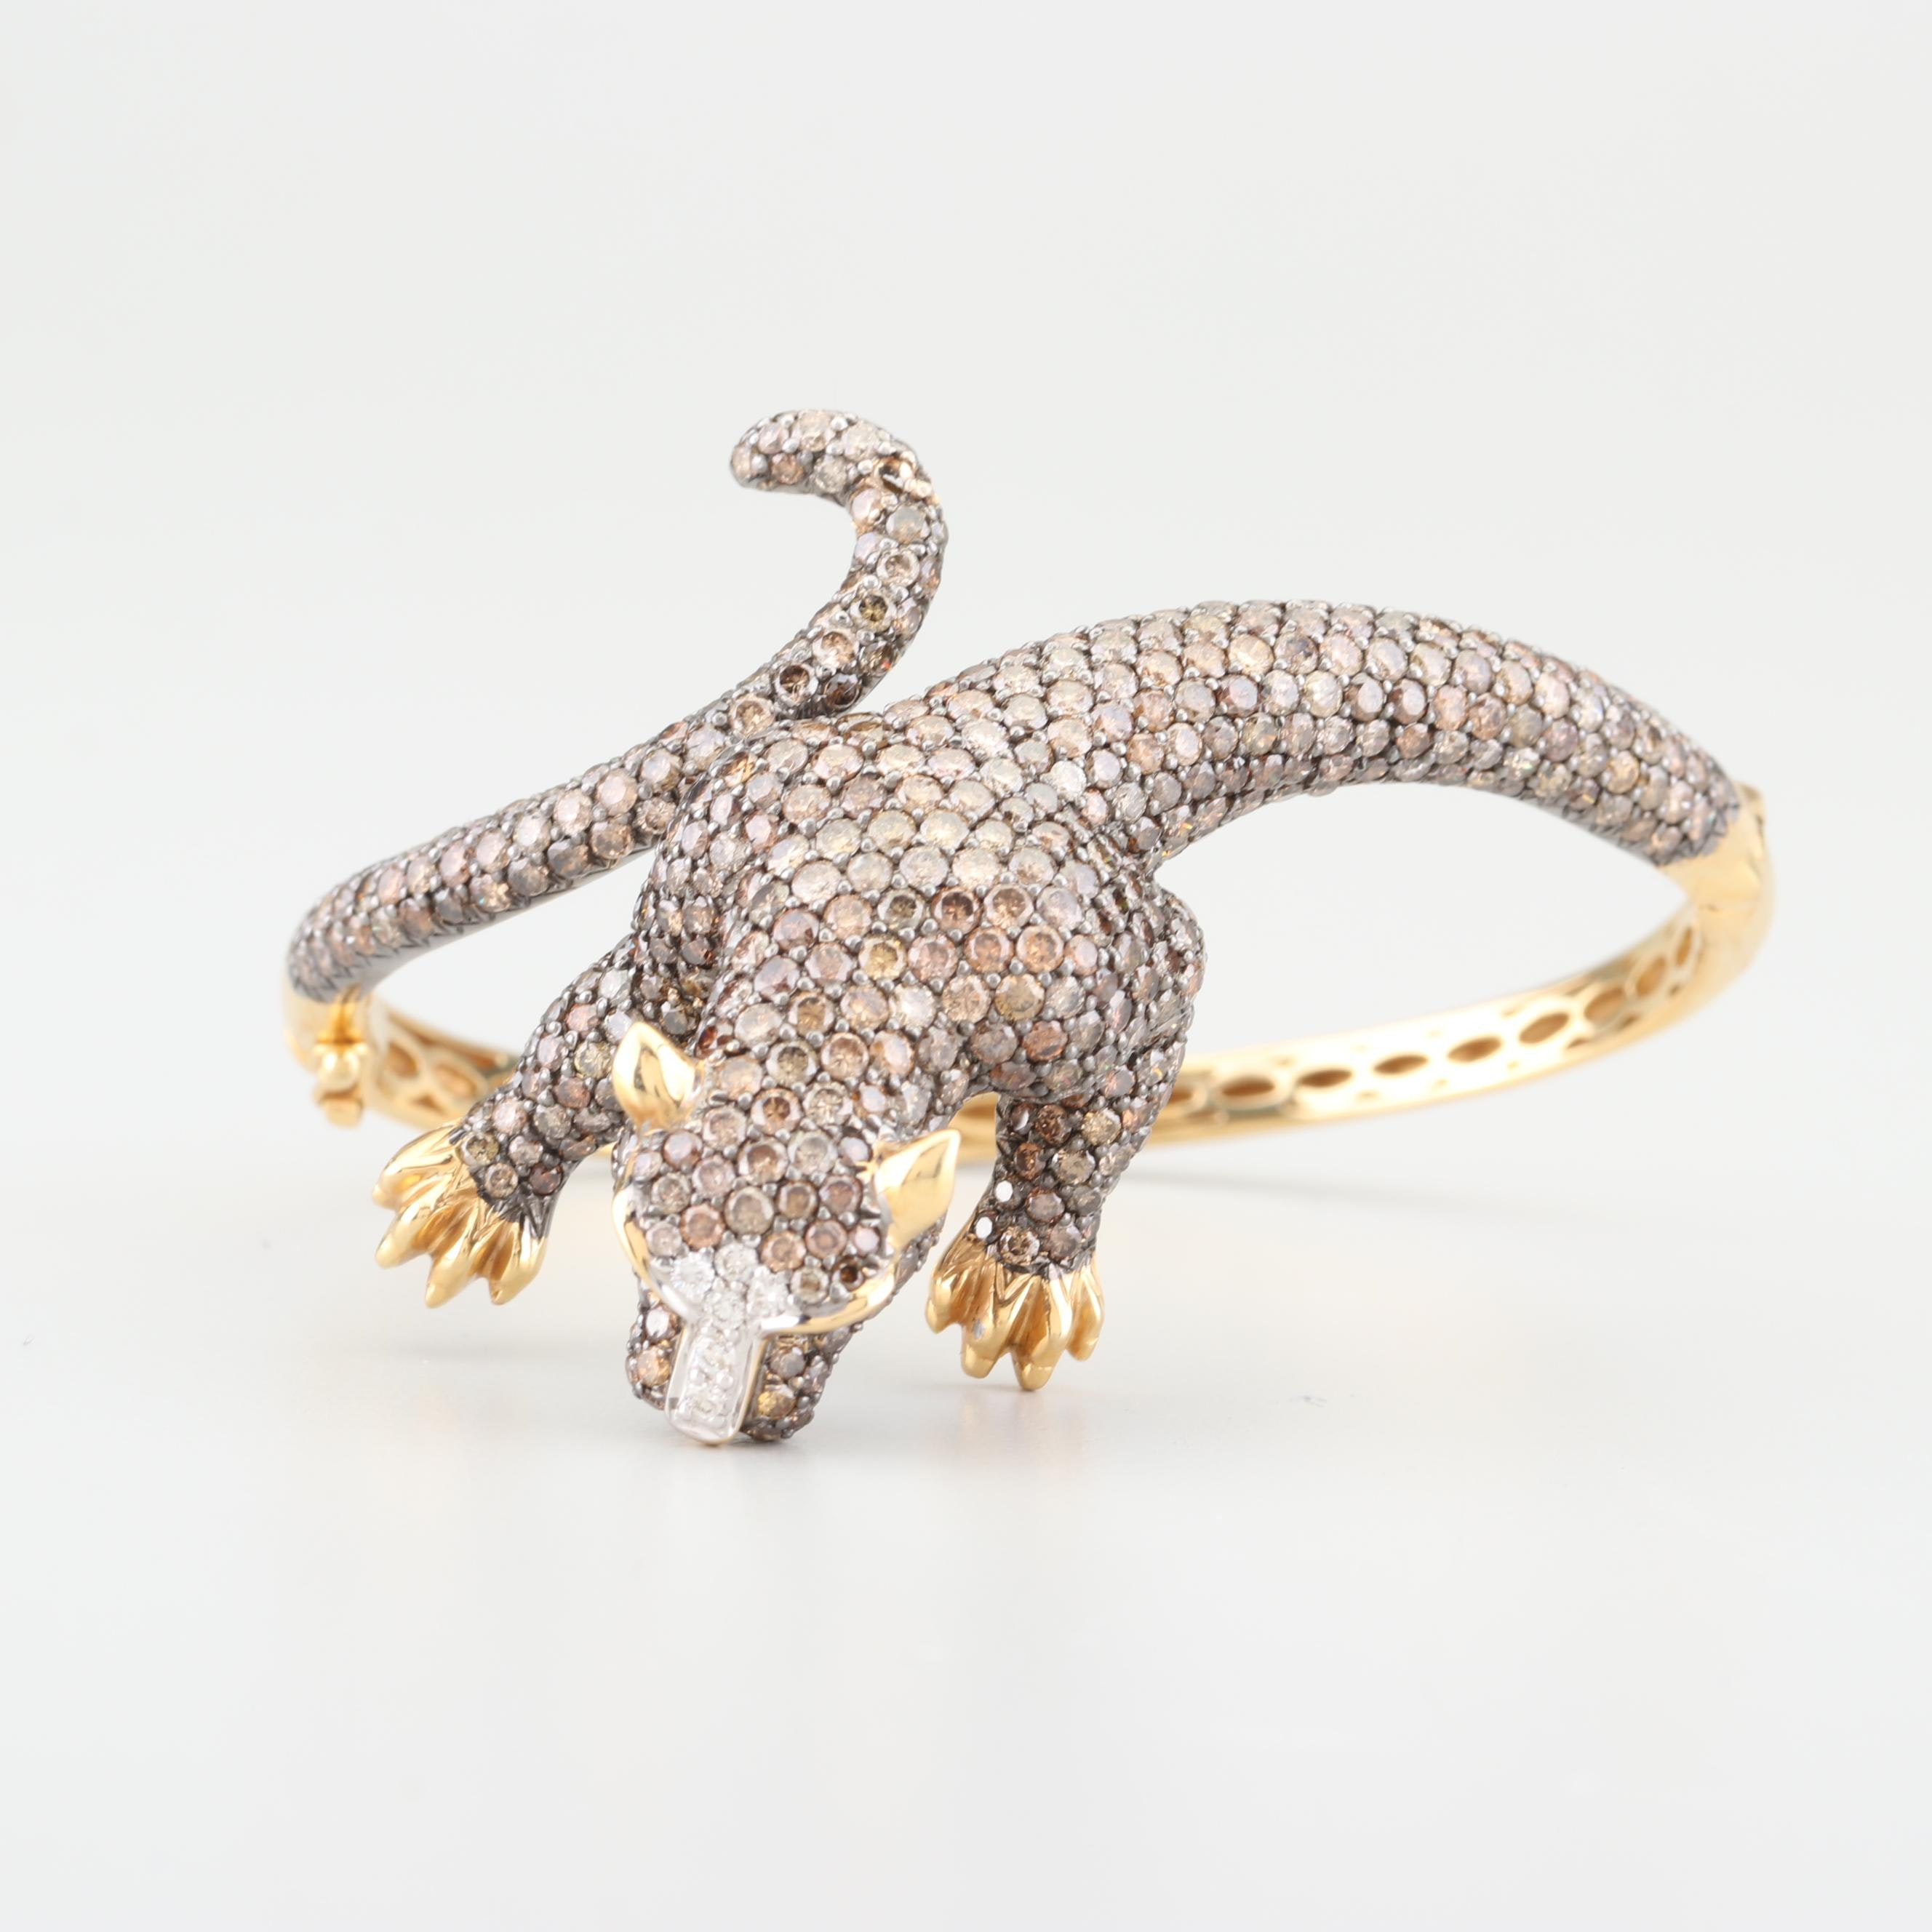 18K Yellow Gold and 10.37 CTW Diamond Jaguar Bracelet